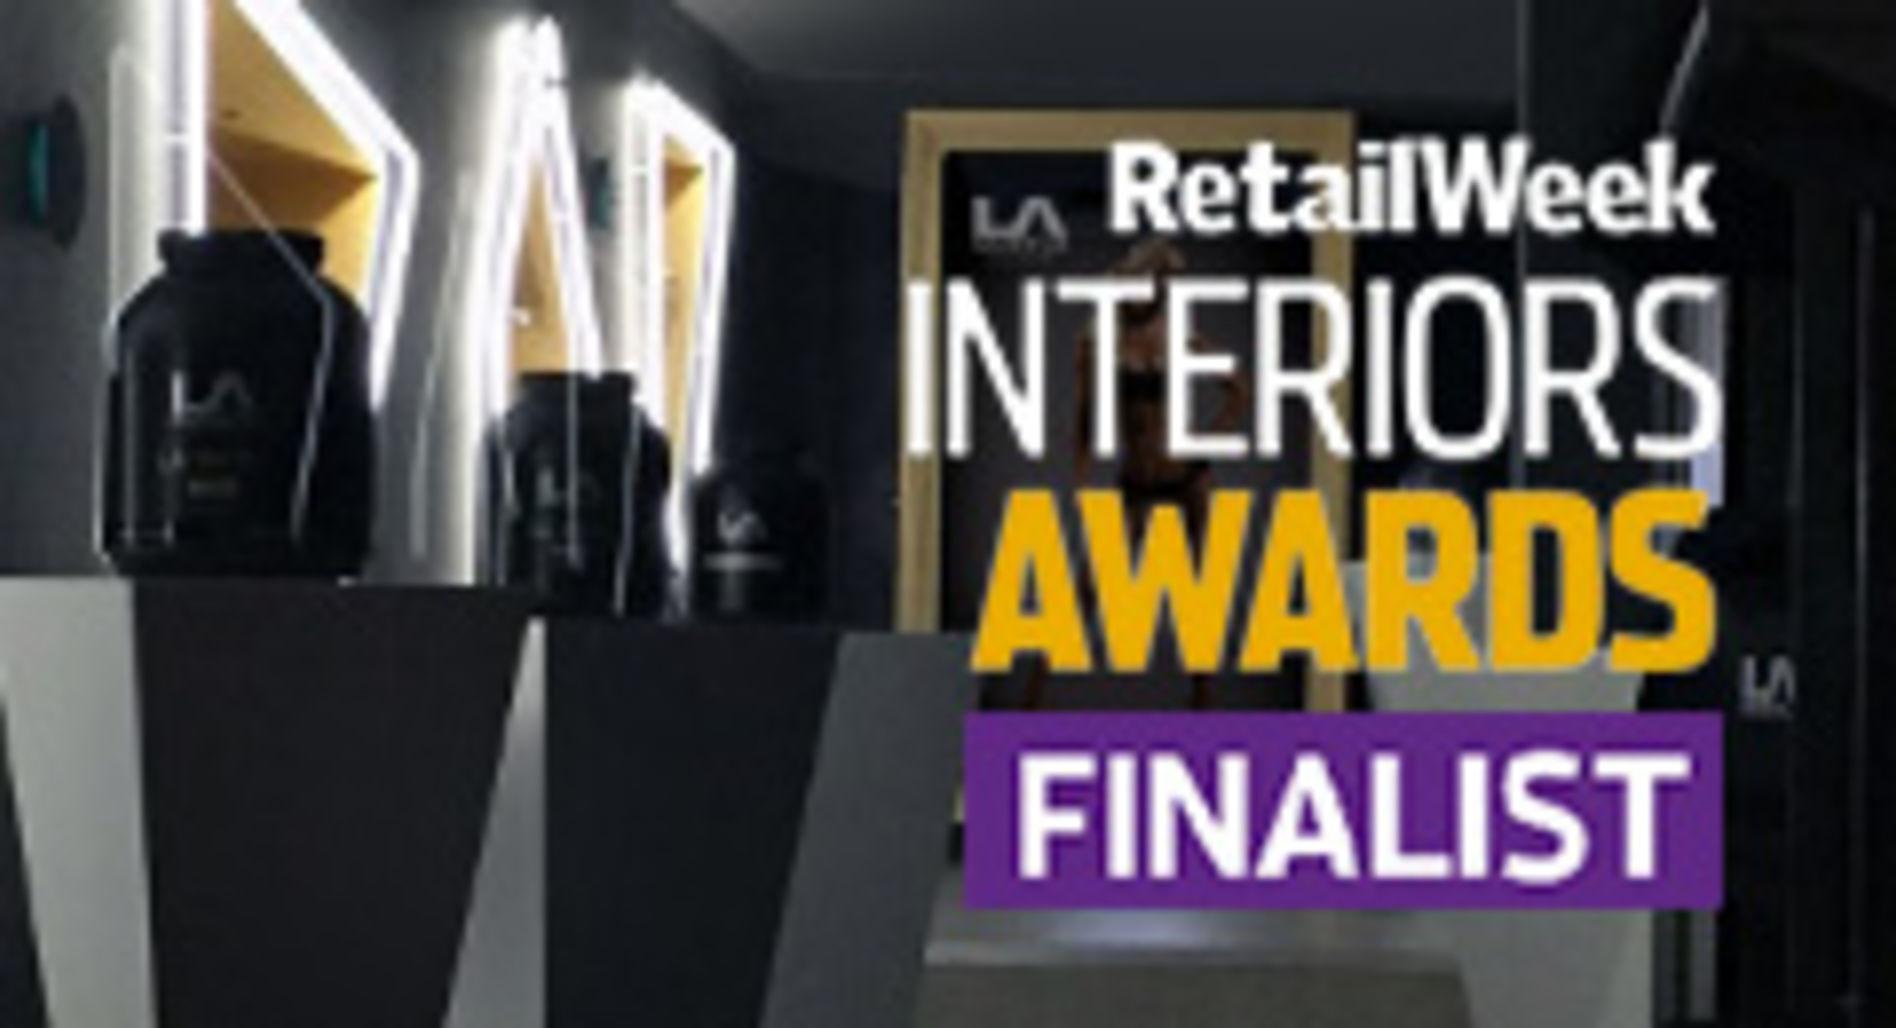 LA Muscle Shop: Finalist in Retail Week Interior Design Awards 2015